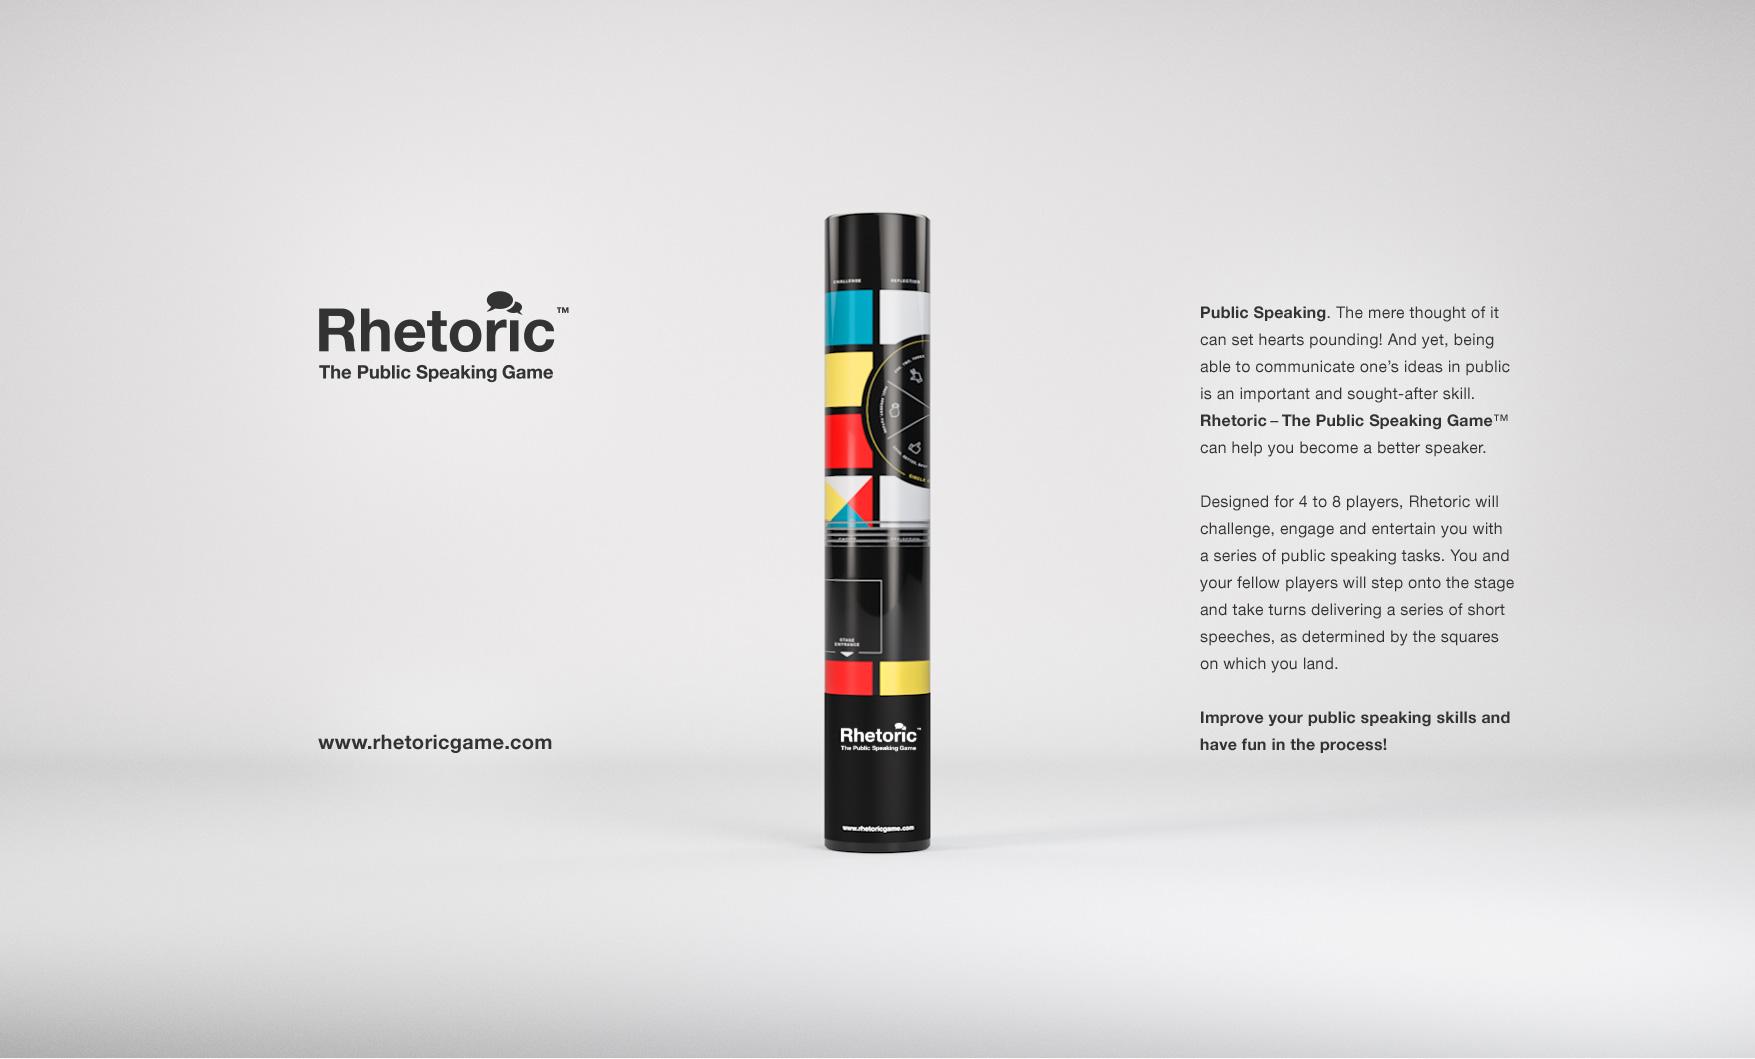 rhetoric_game-packaging-design-preview_product-design_ingmar-koglin